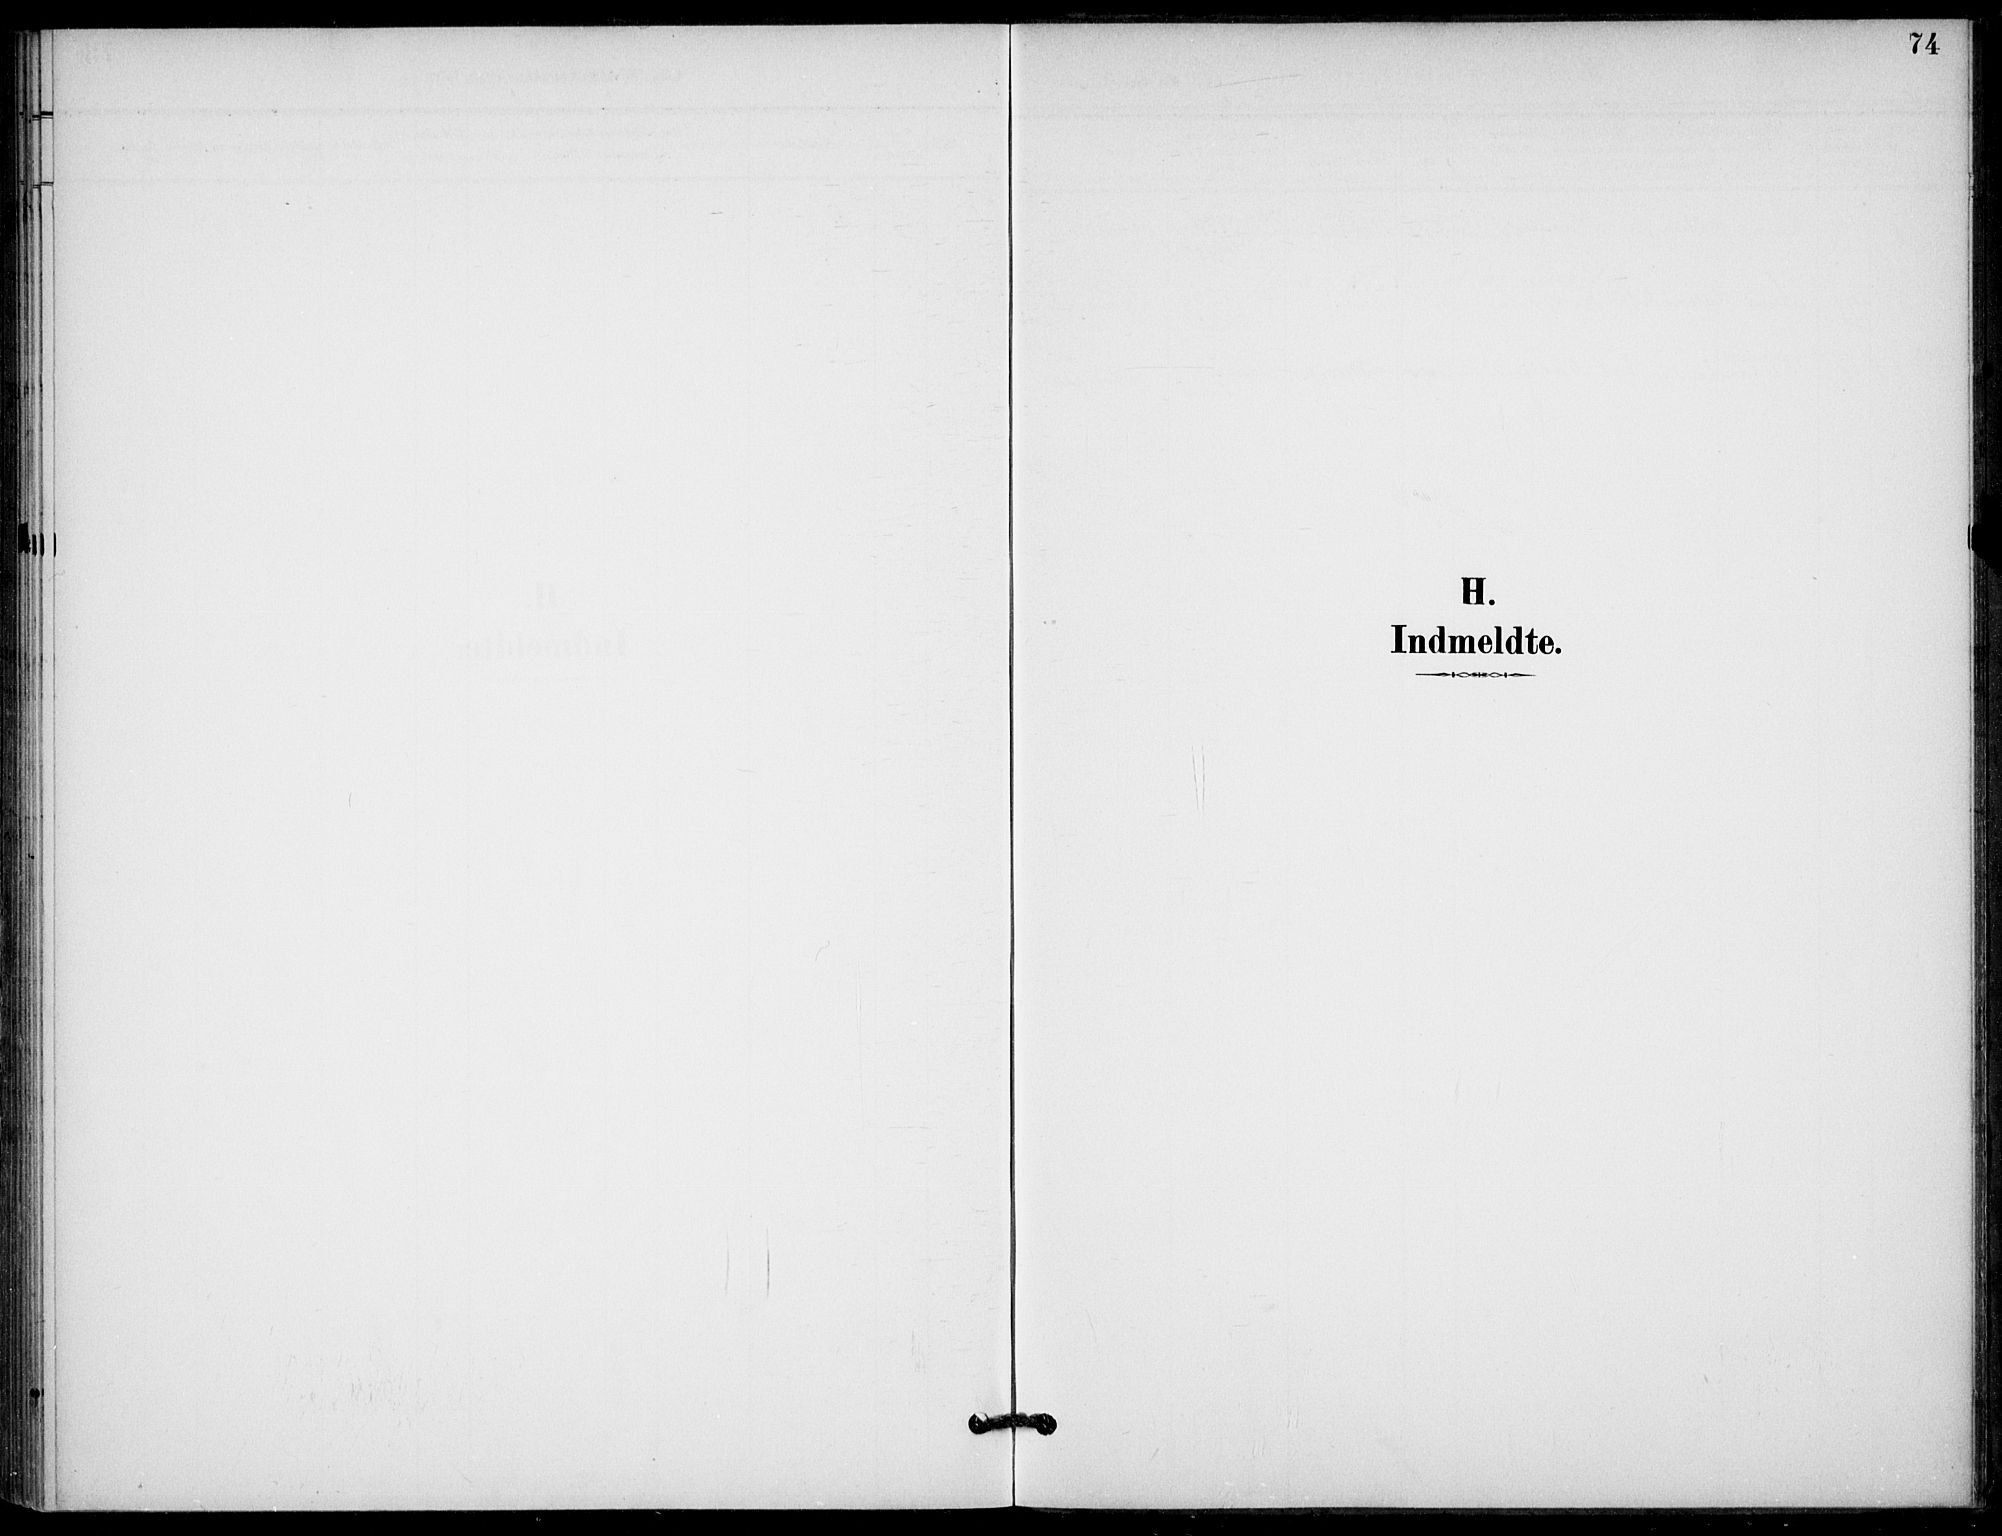 SAKO, Lunde kirkebøker, F/Fb/L0004: Ministerialbok nr. II 4, 1892-1907, s. 74